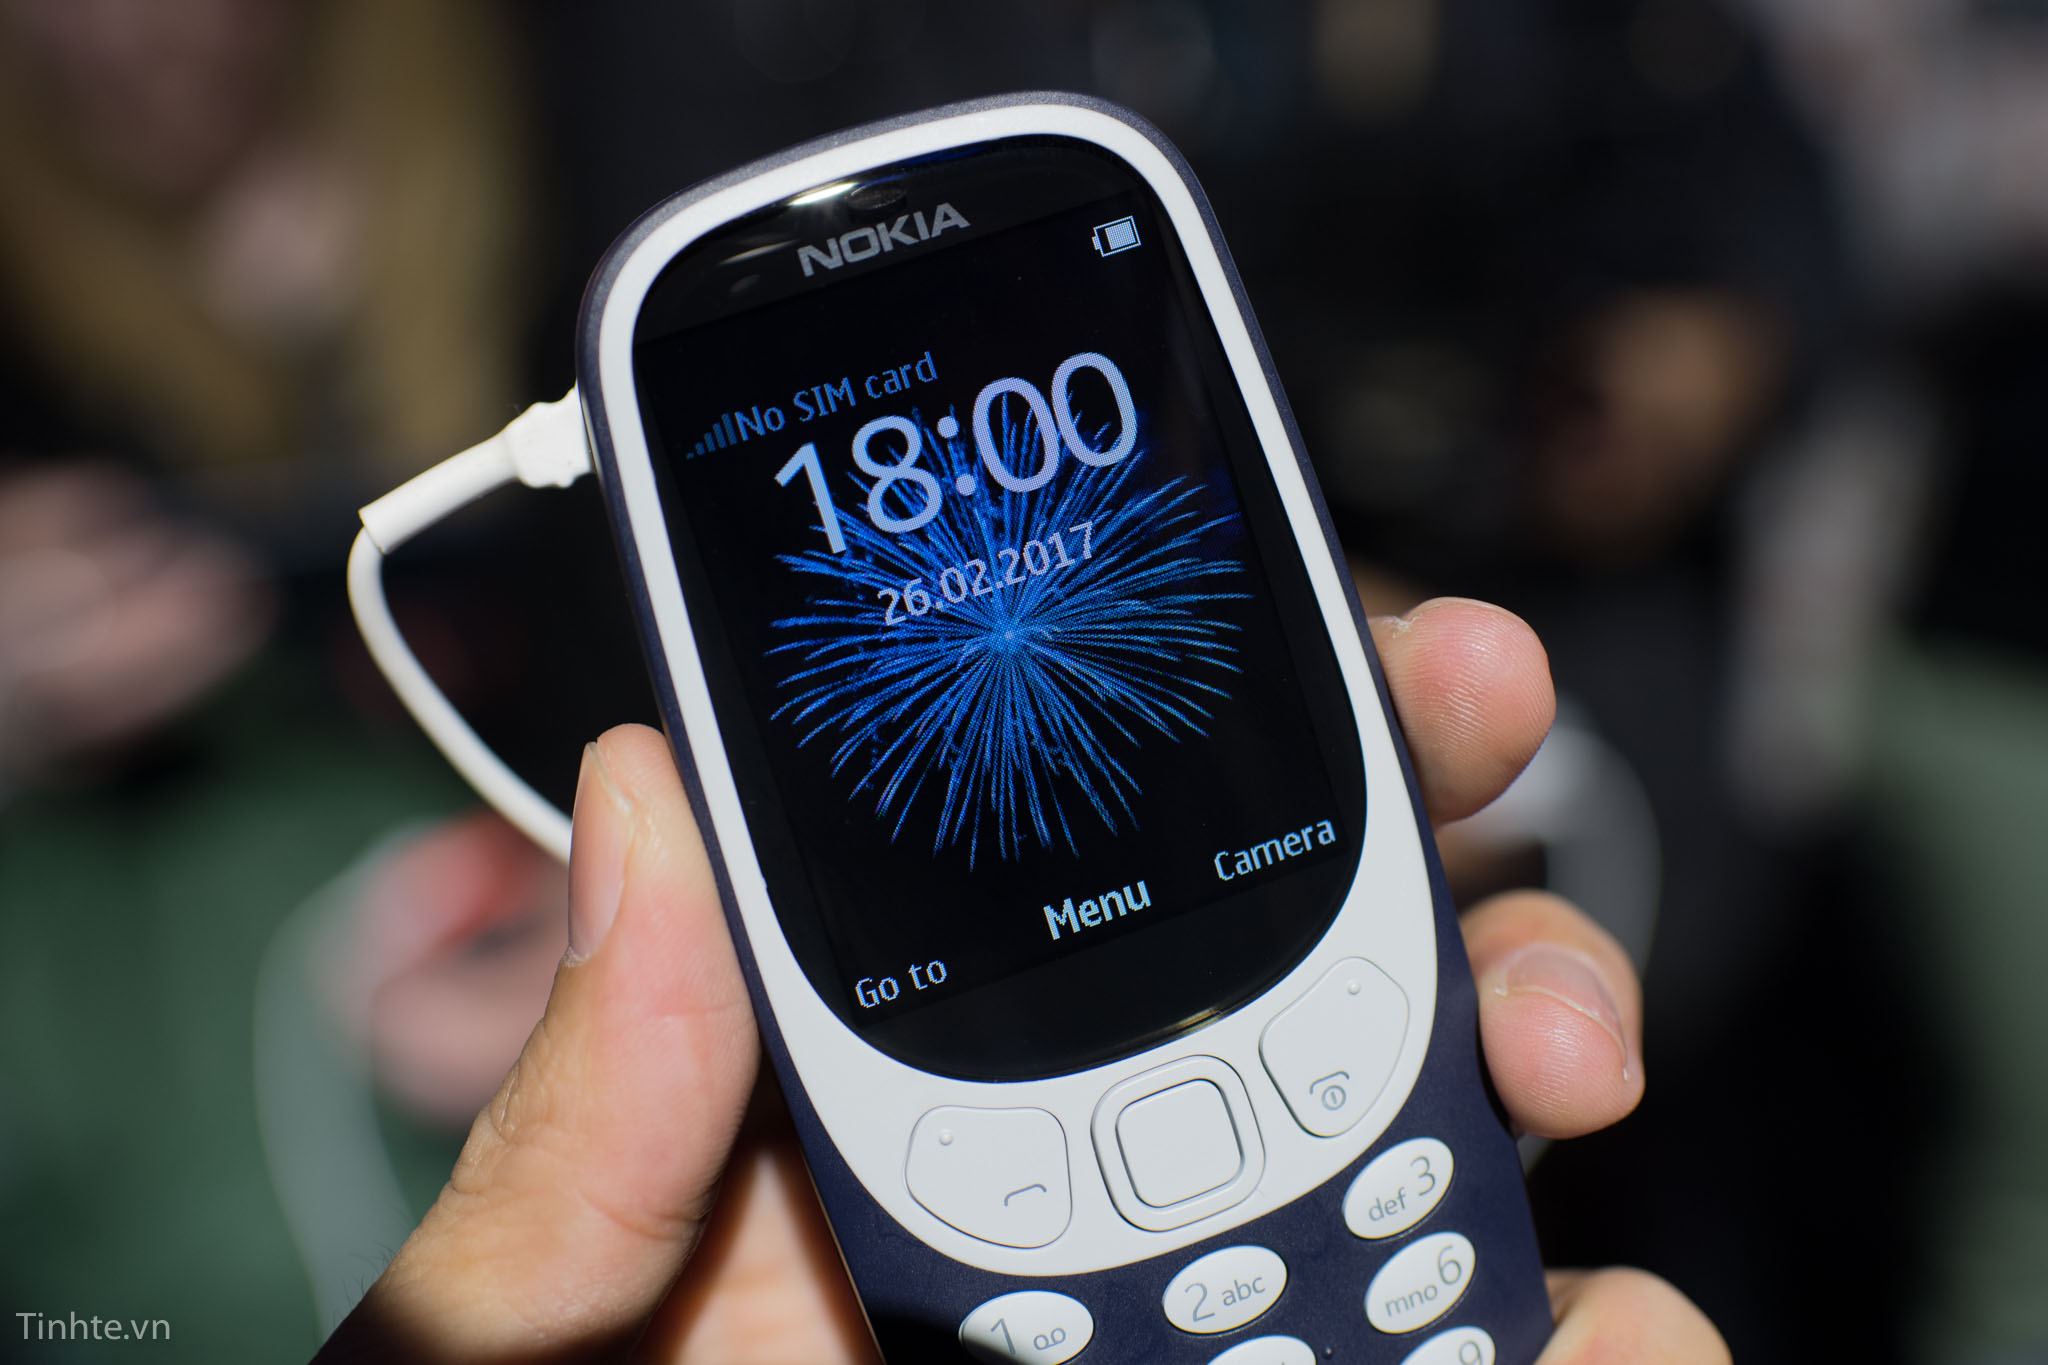 Nokia3310-11.jpg